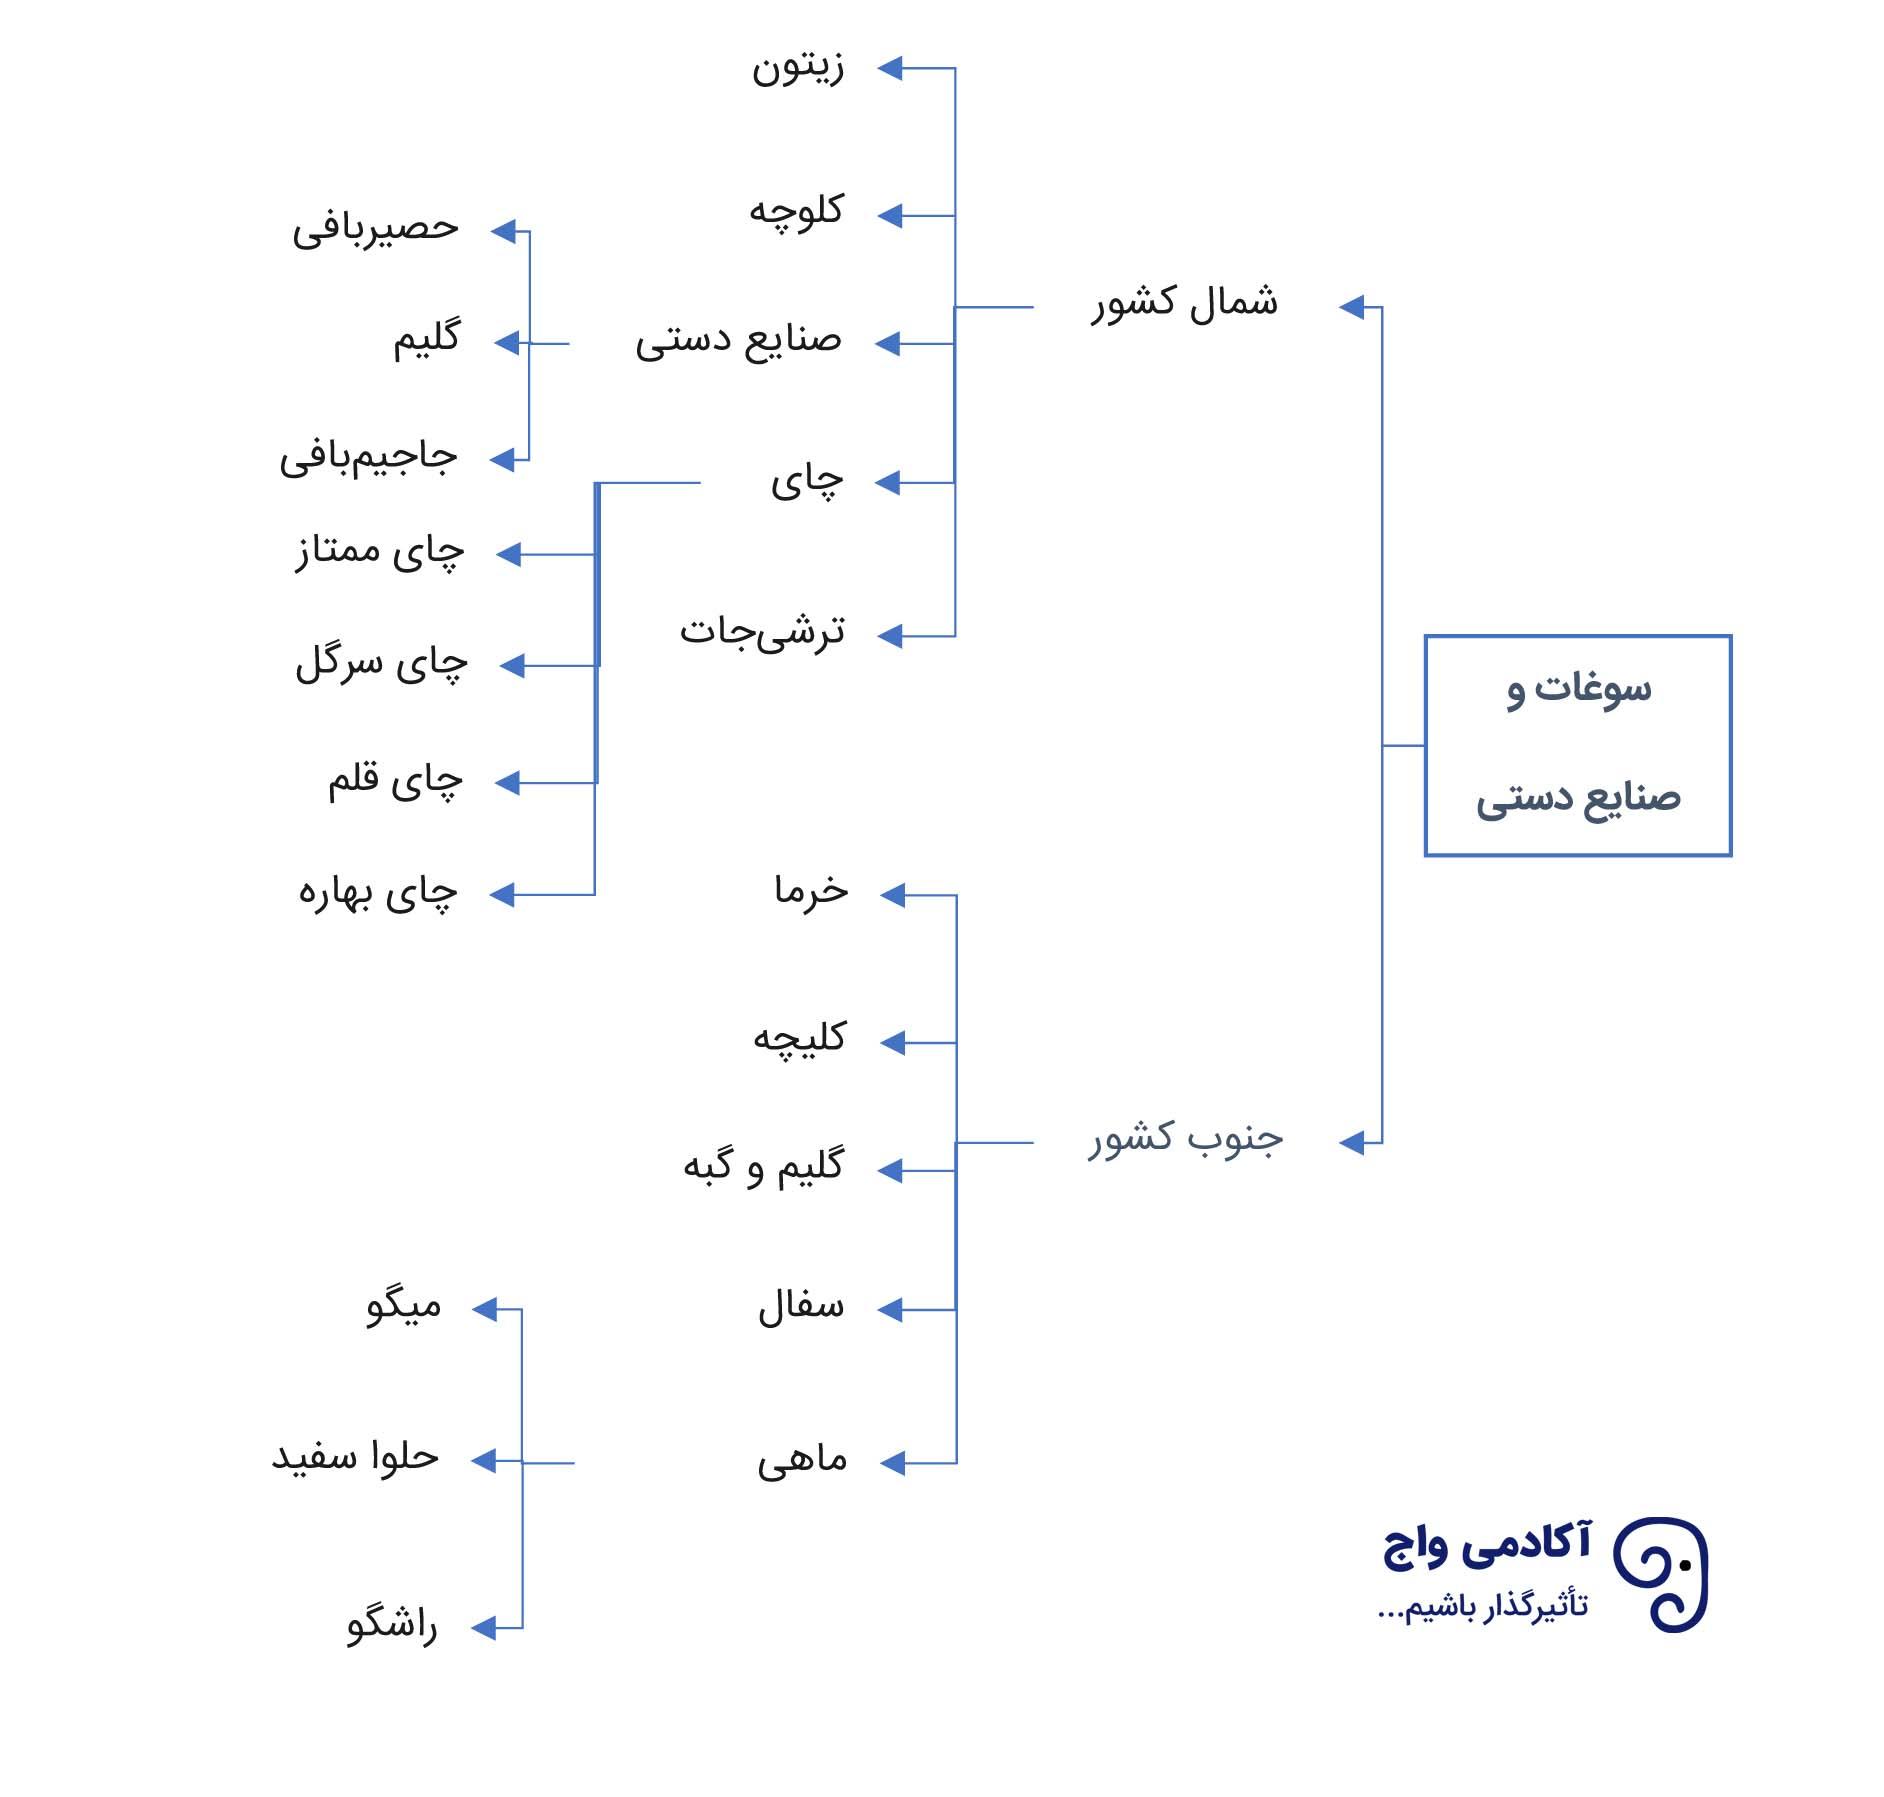 نمونه ساختار چینش کلیدواژهها بر اساس تم ایجاد شده